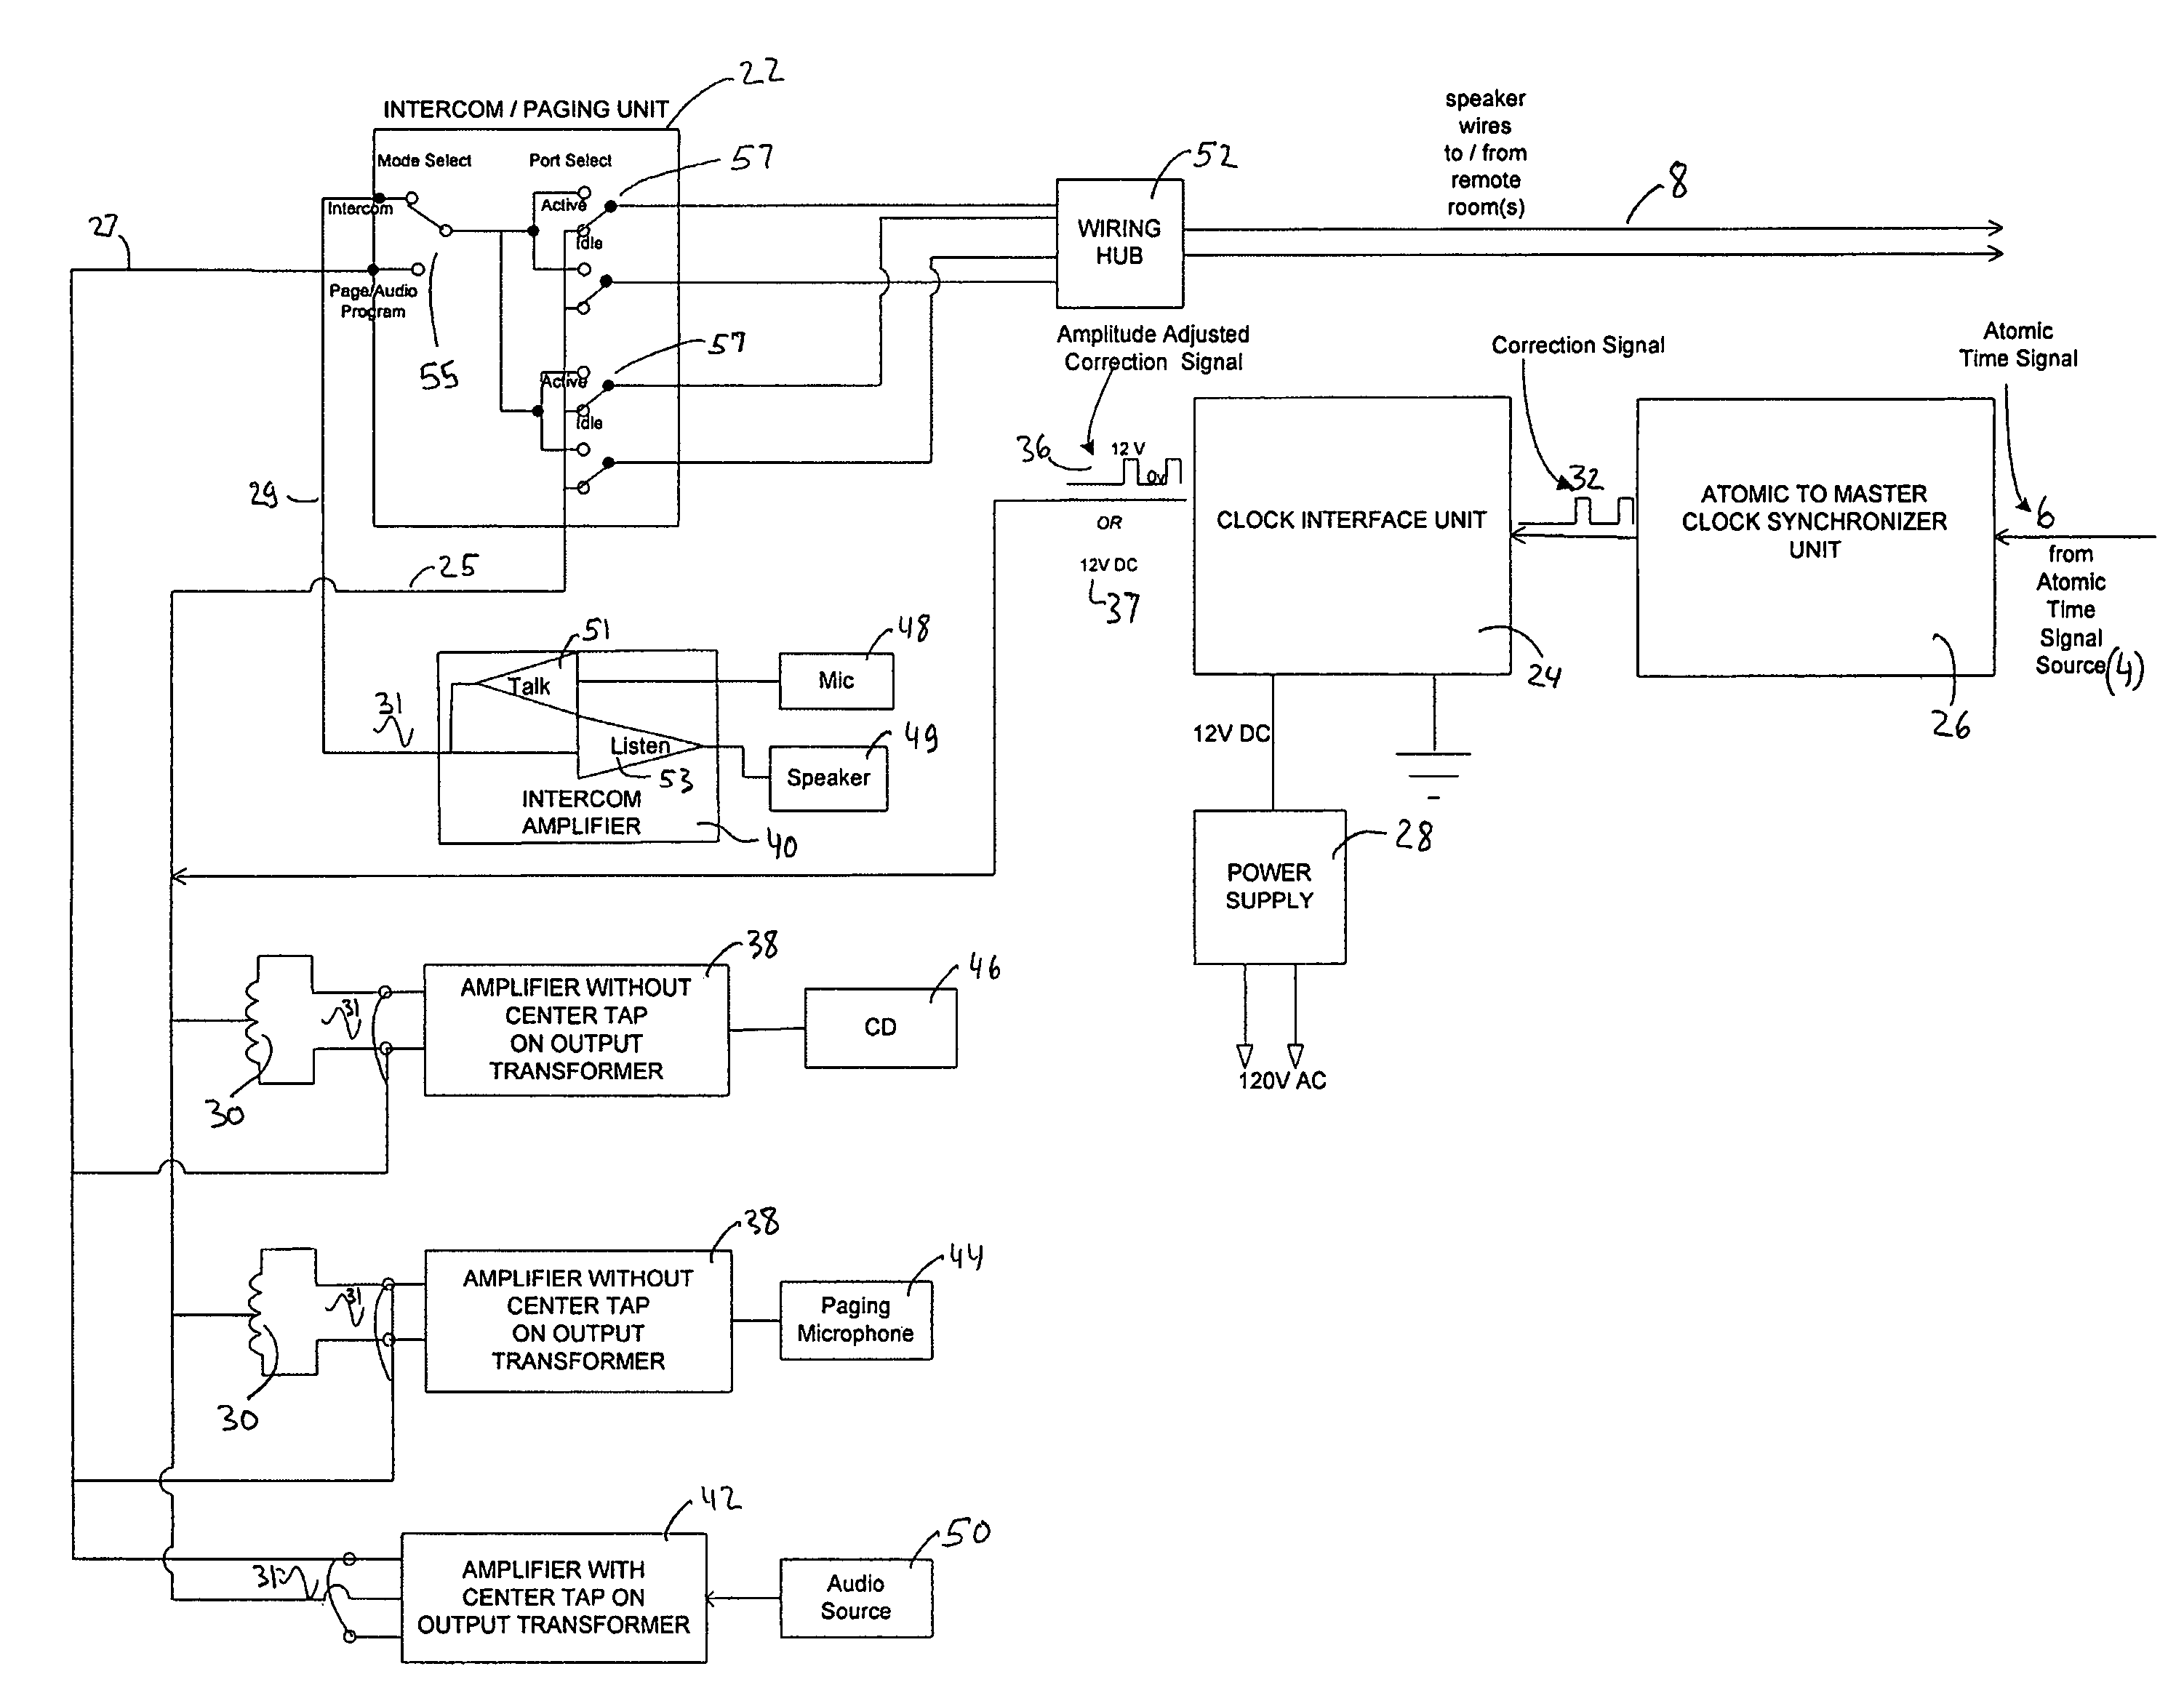 dukane intercom speaker wiring diagram fpe panel diagram